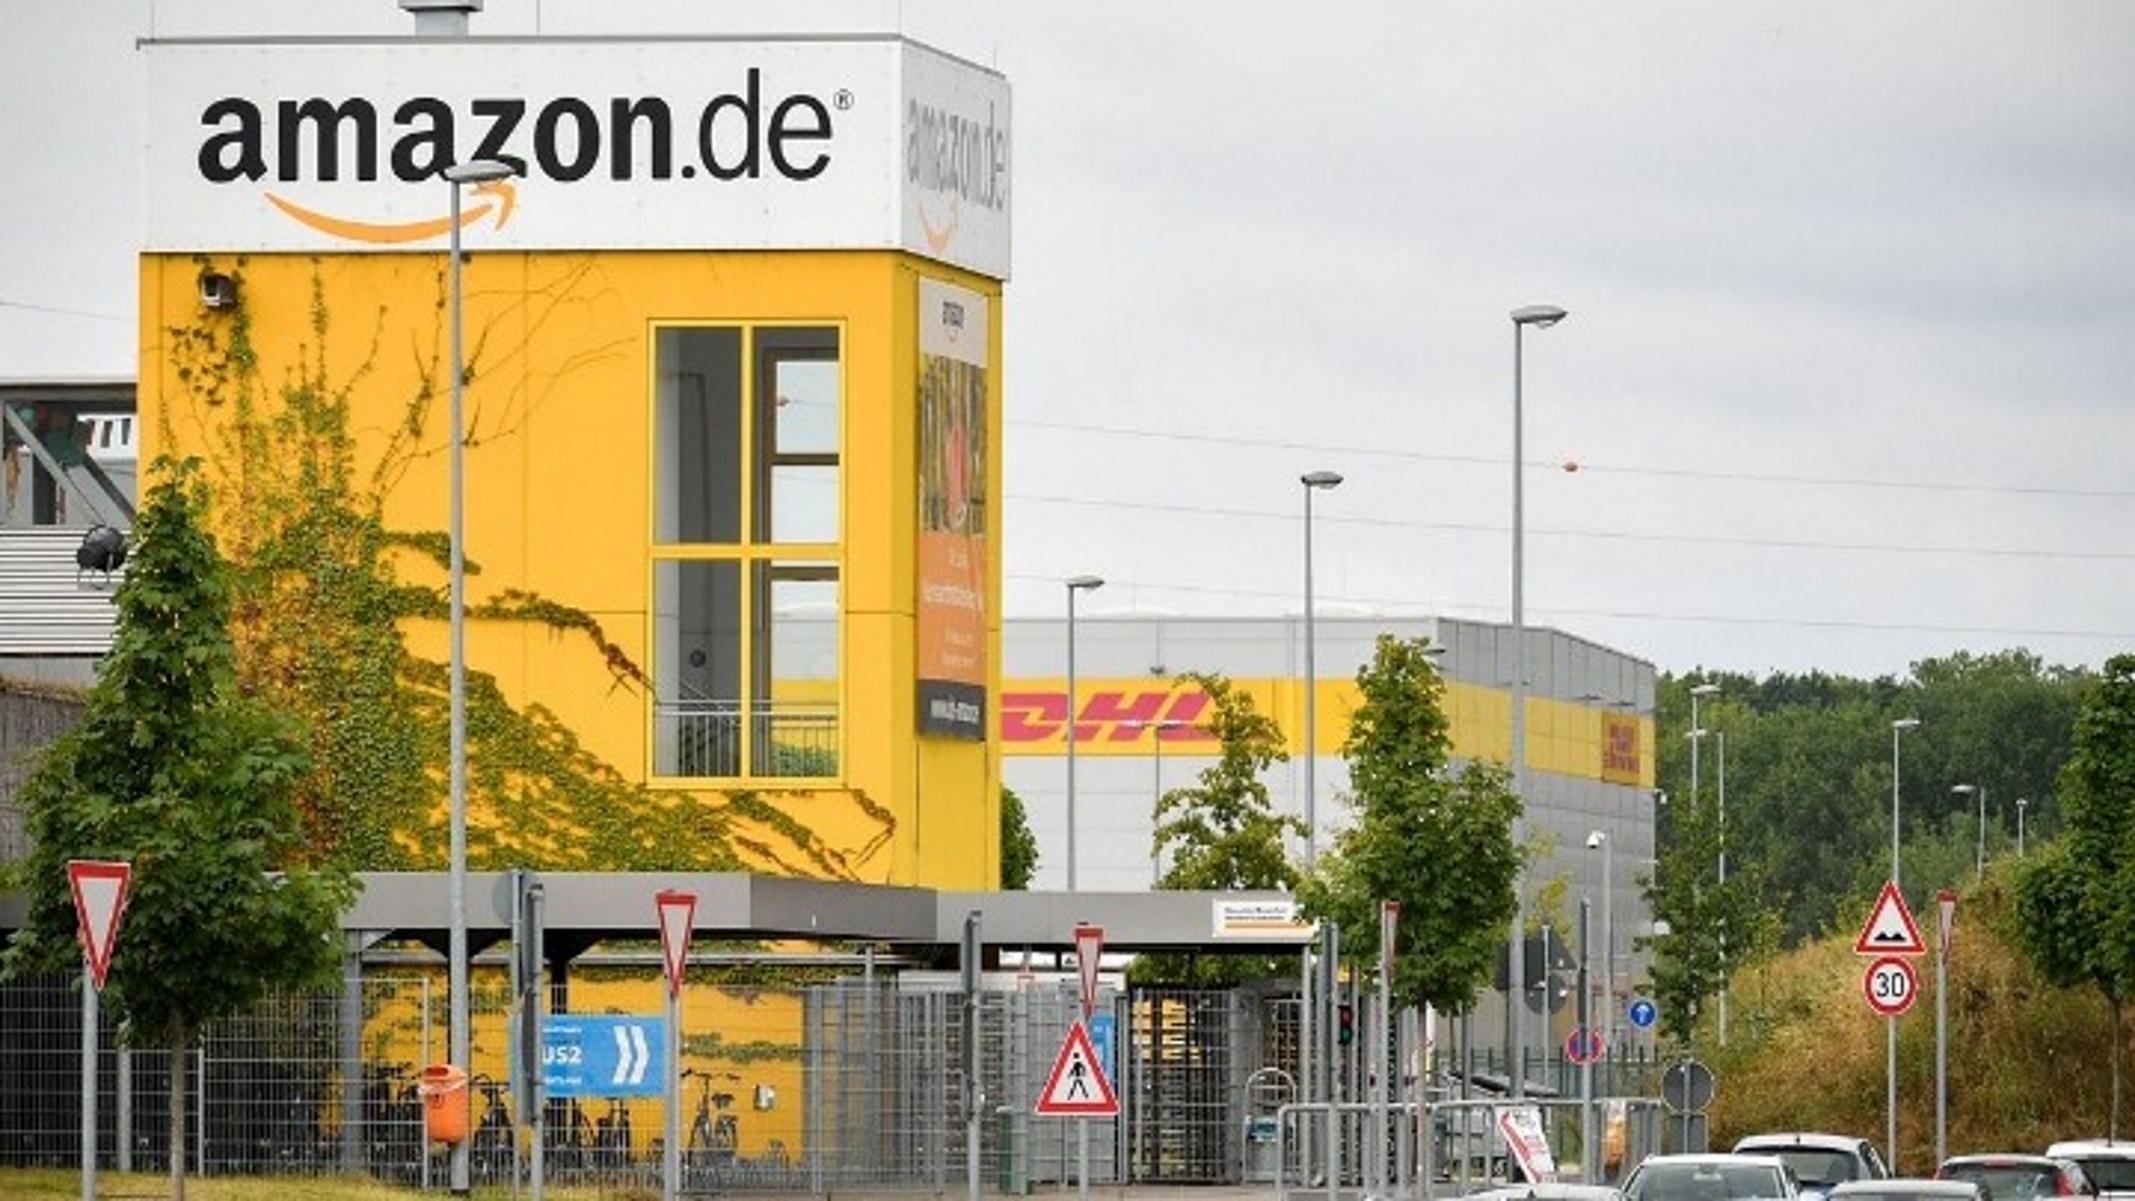 Amazon – Γερμανία: Τετραήμερη απεργία χιλιάδων υπαλλήλων για τις συνθήκες εργασίας